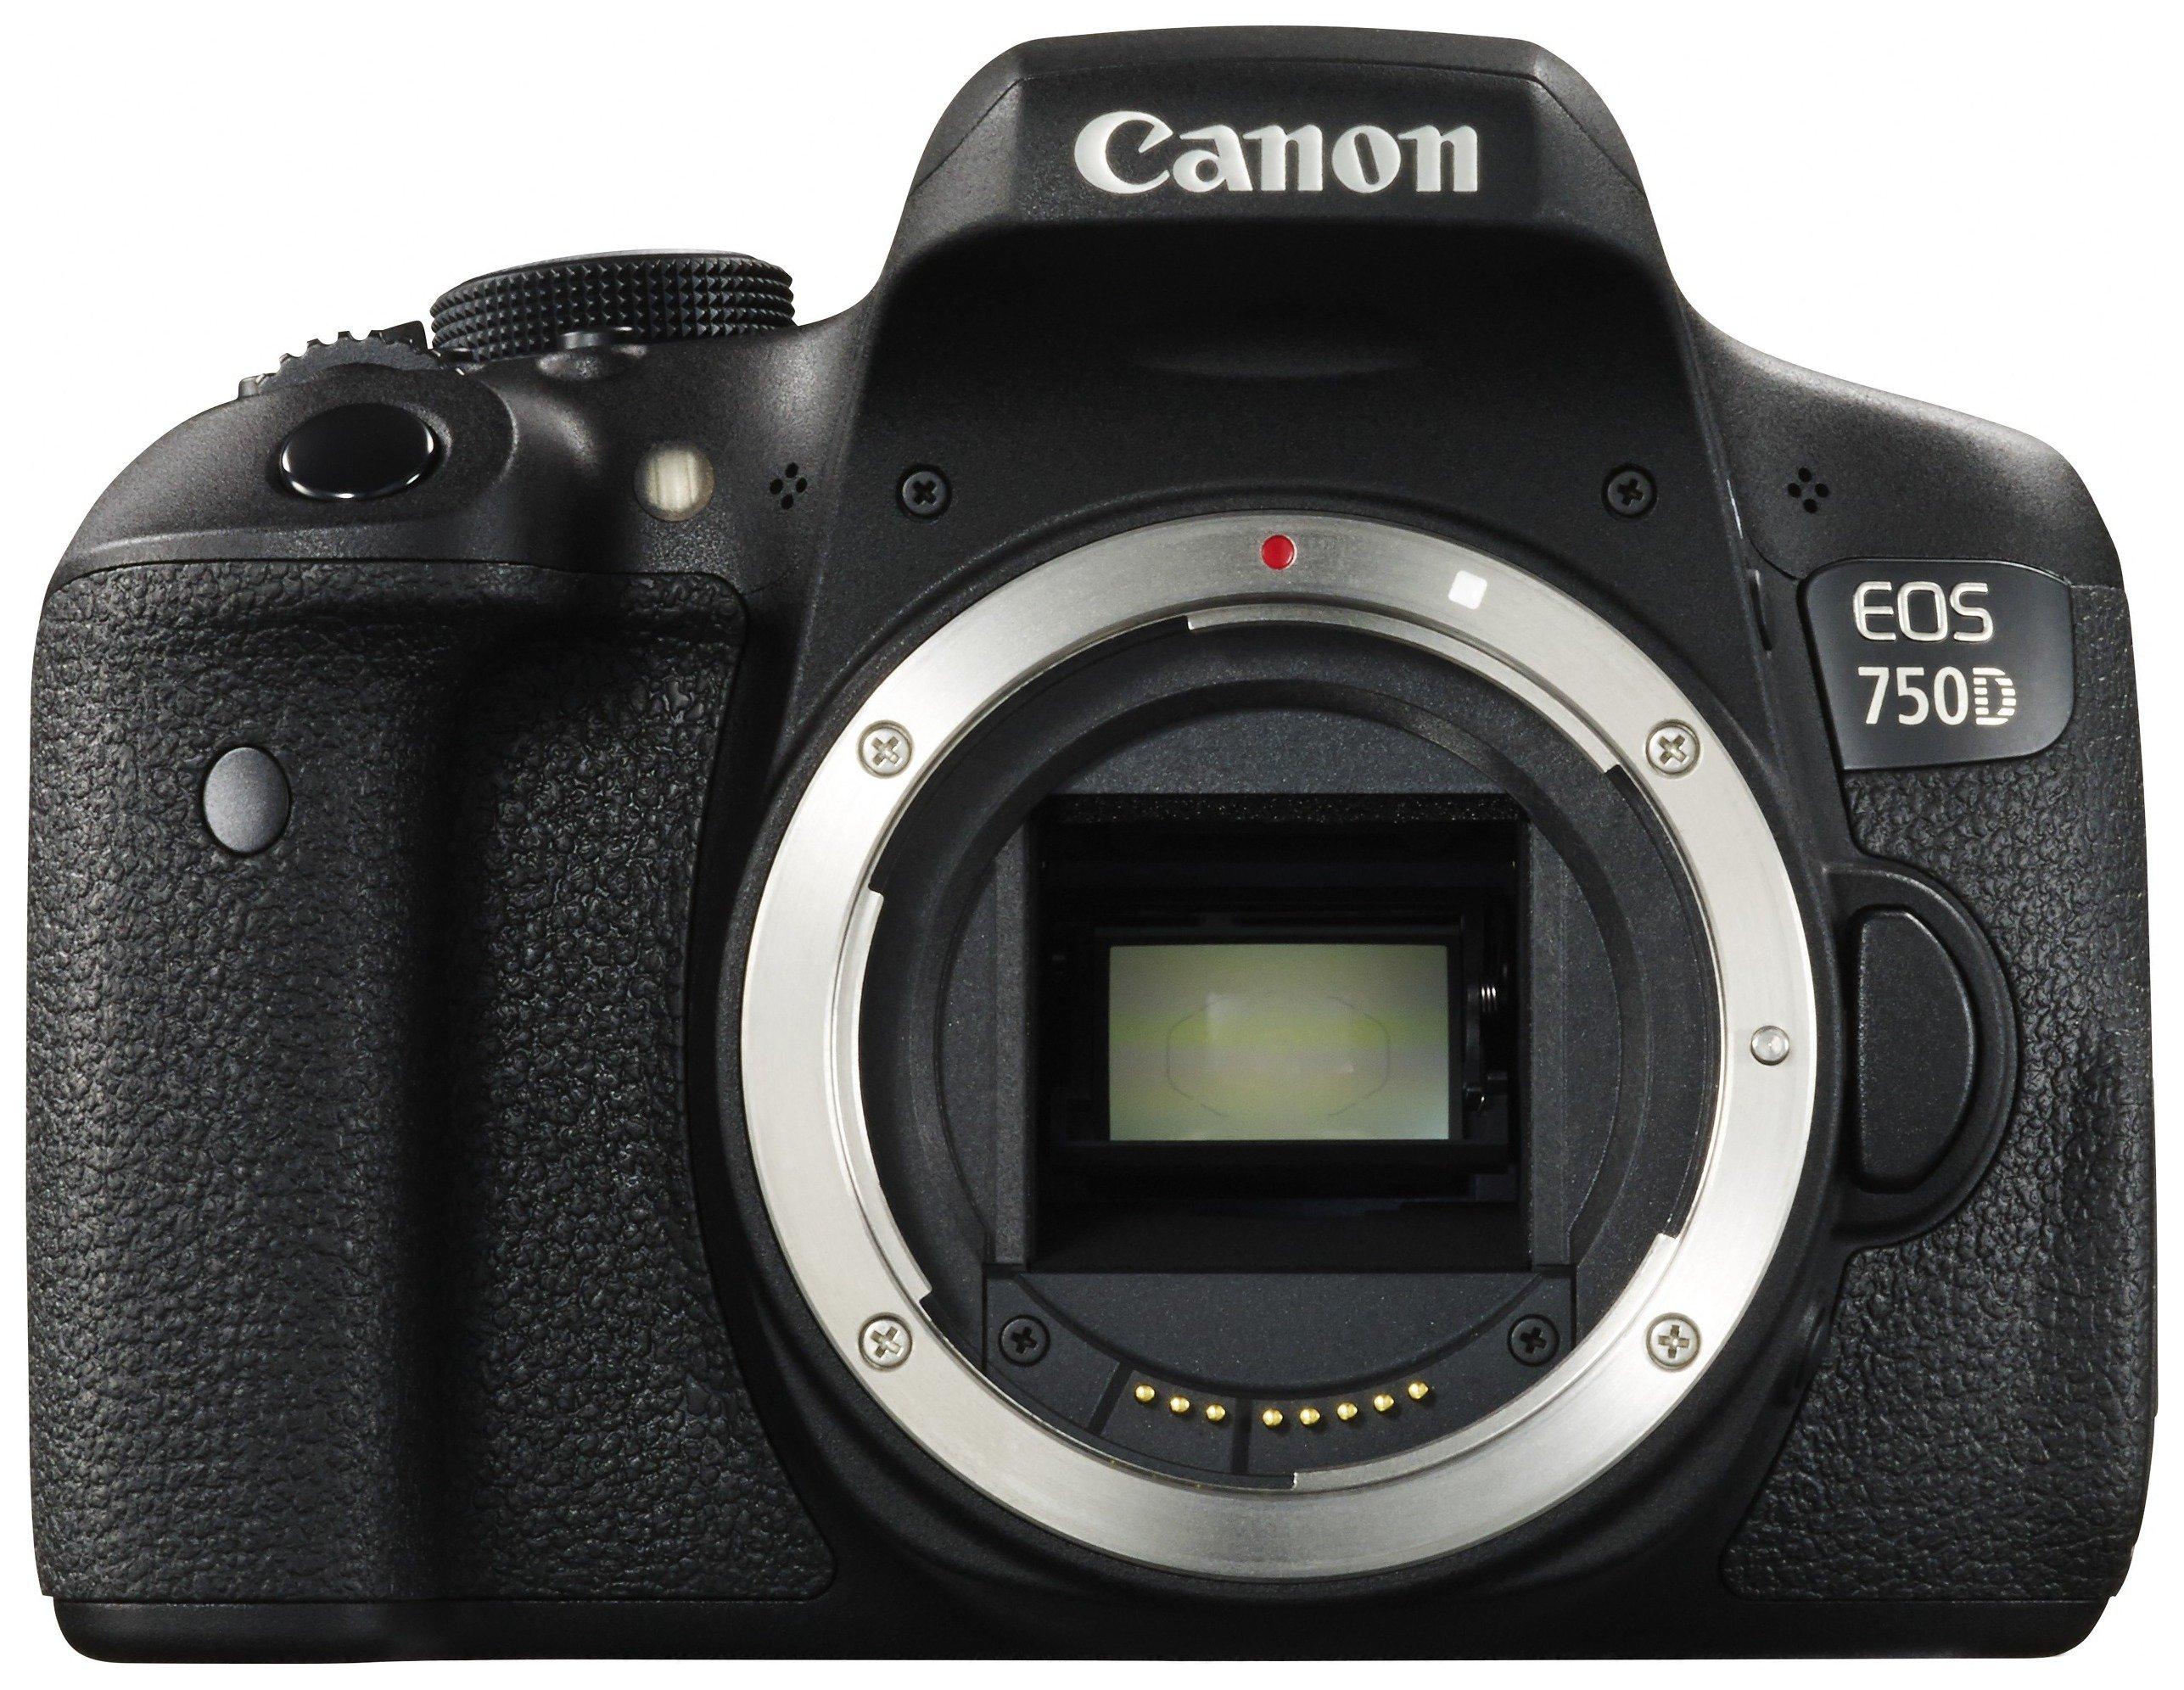 Canon EOS 750D DSLR Camera 24.2MP - Body Only